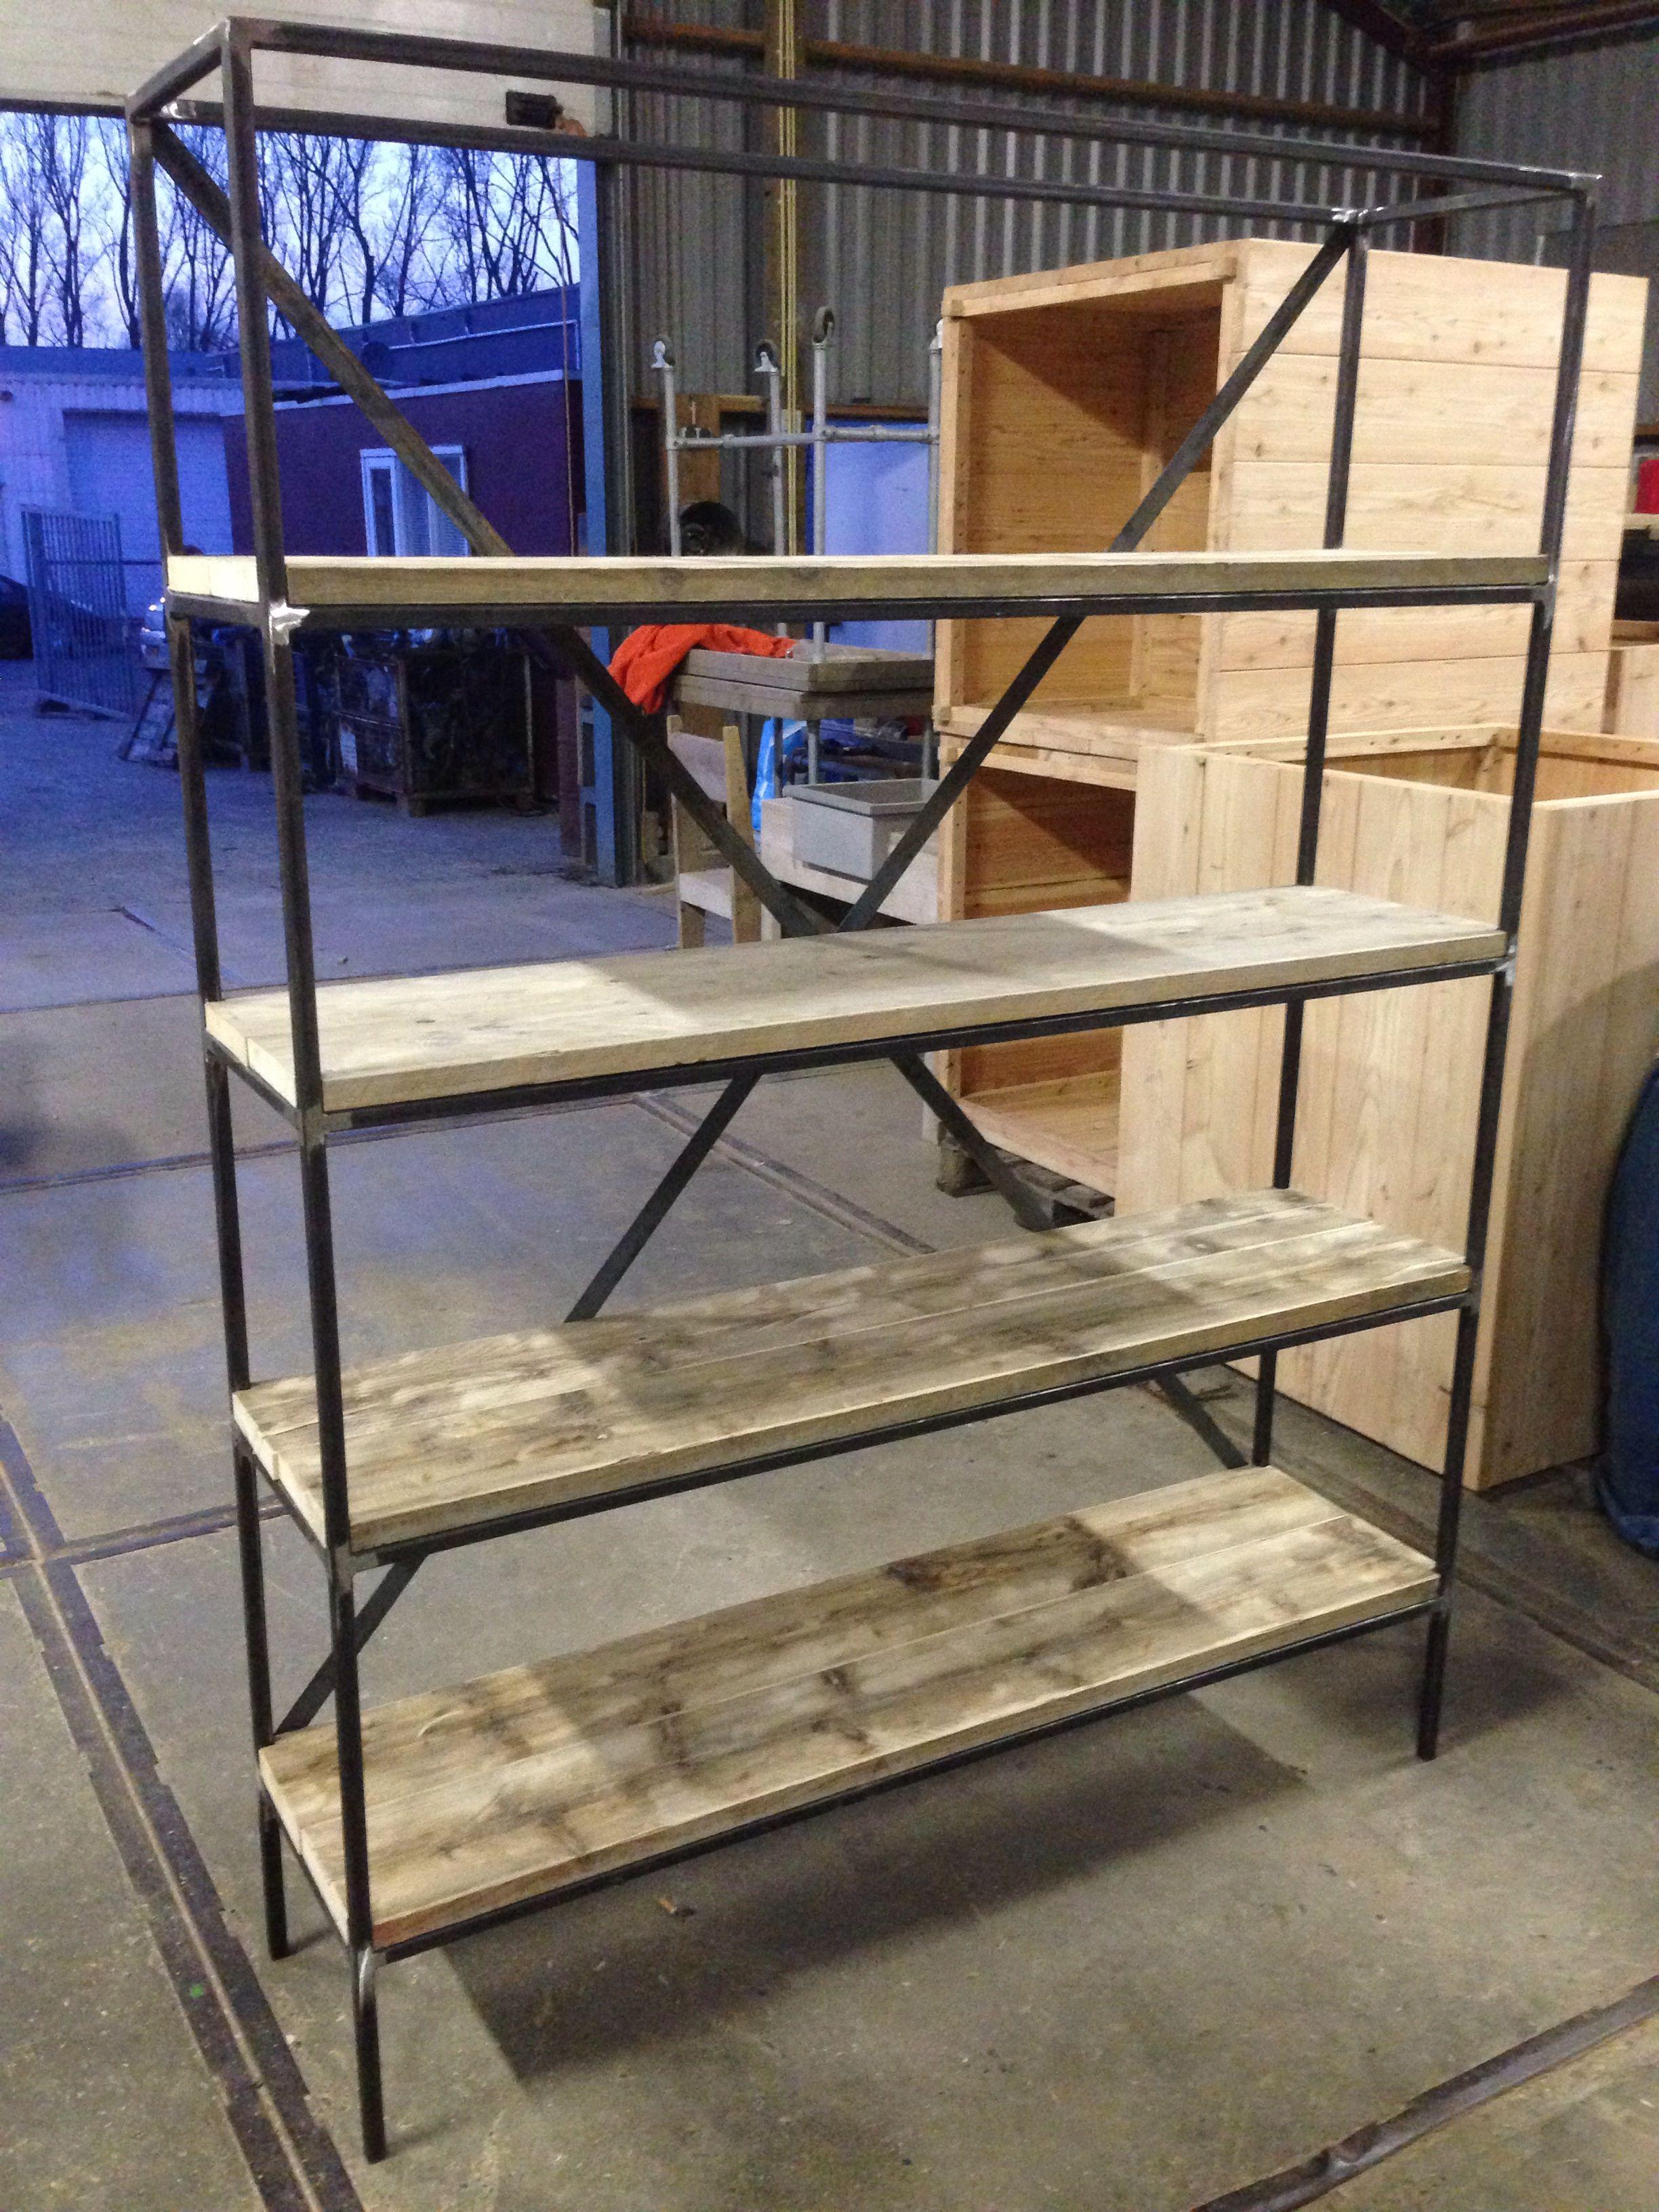 Stalen Frame Voor Kast.Kast Met Legplanken Van Steigerhout En Stalen Frame